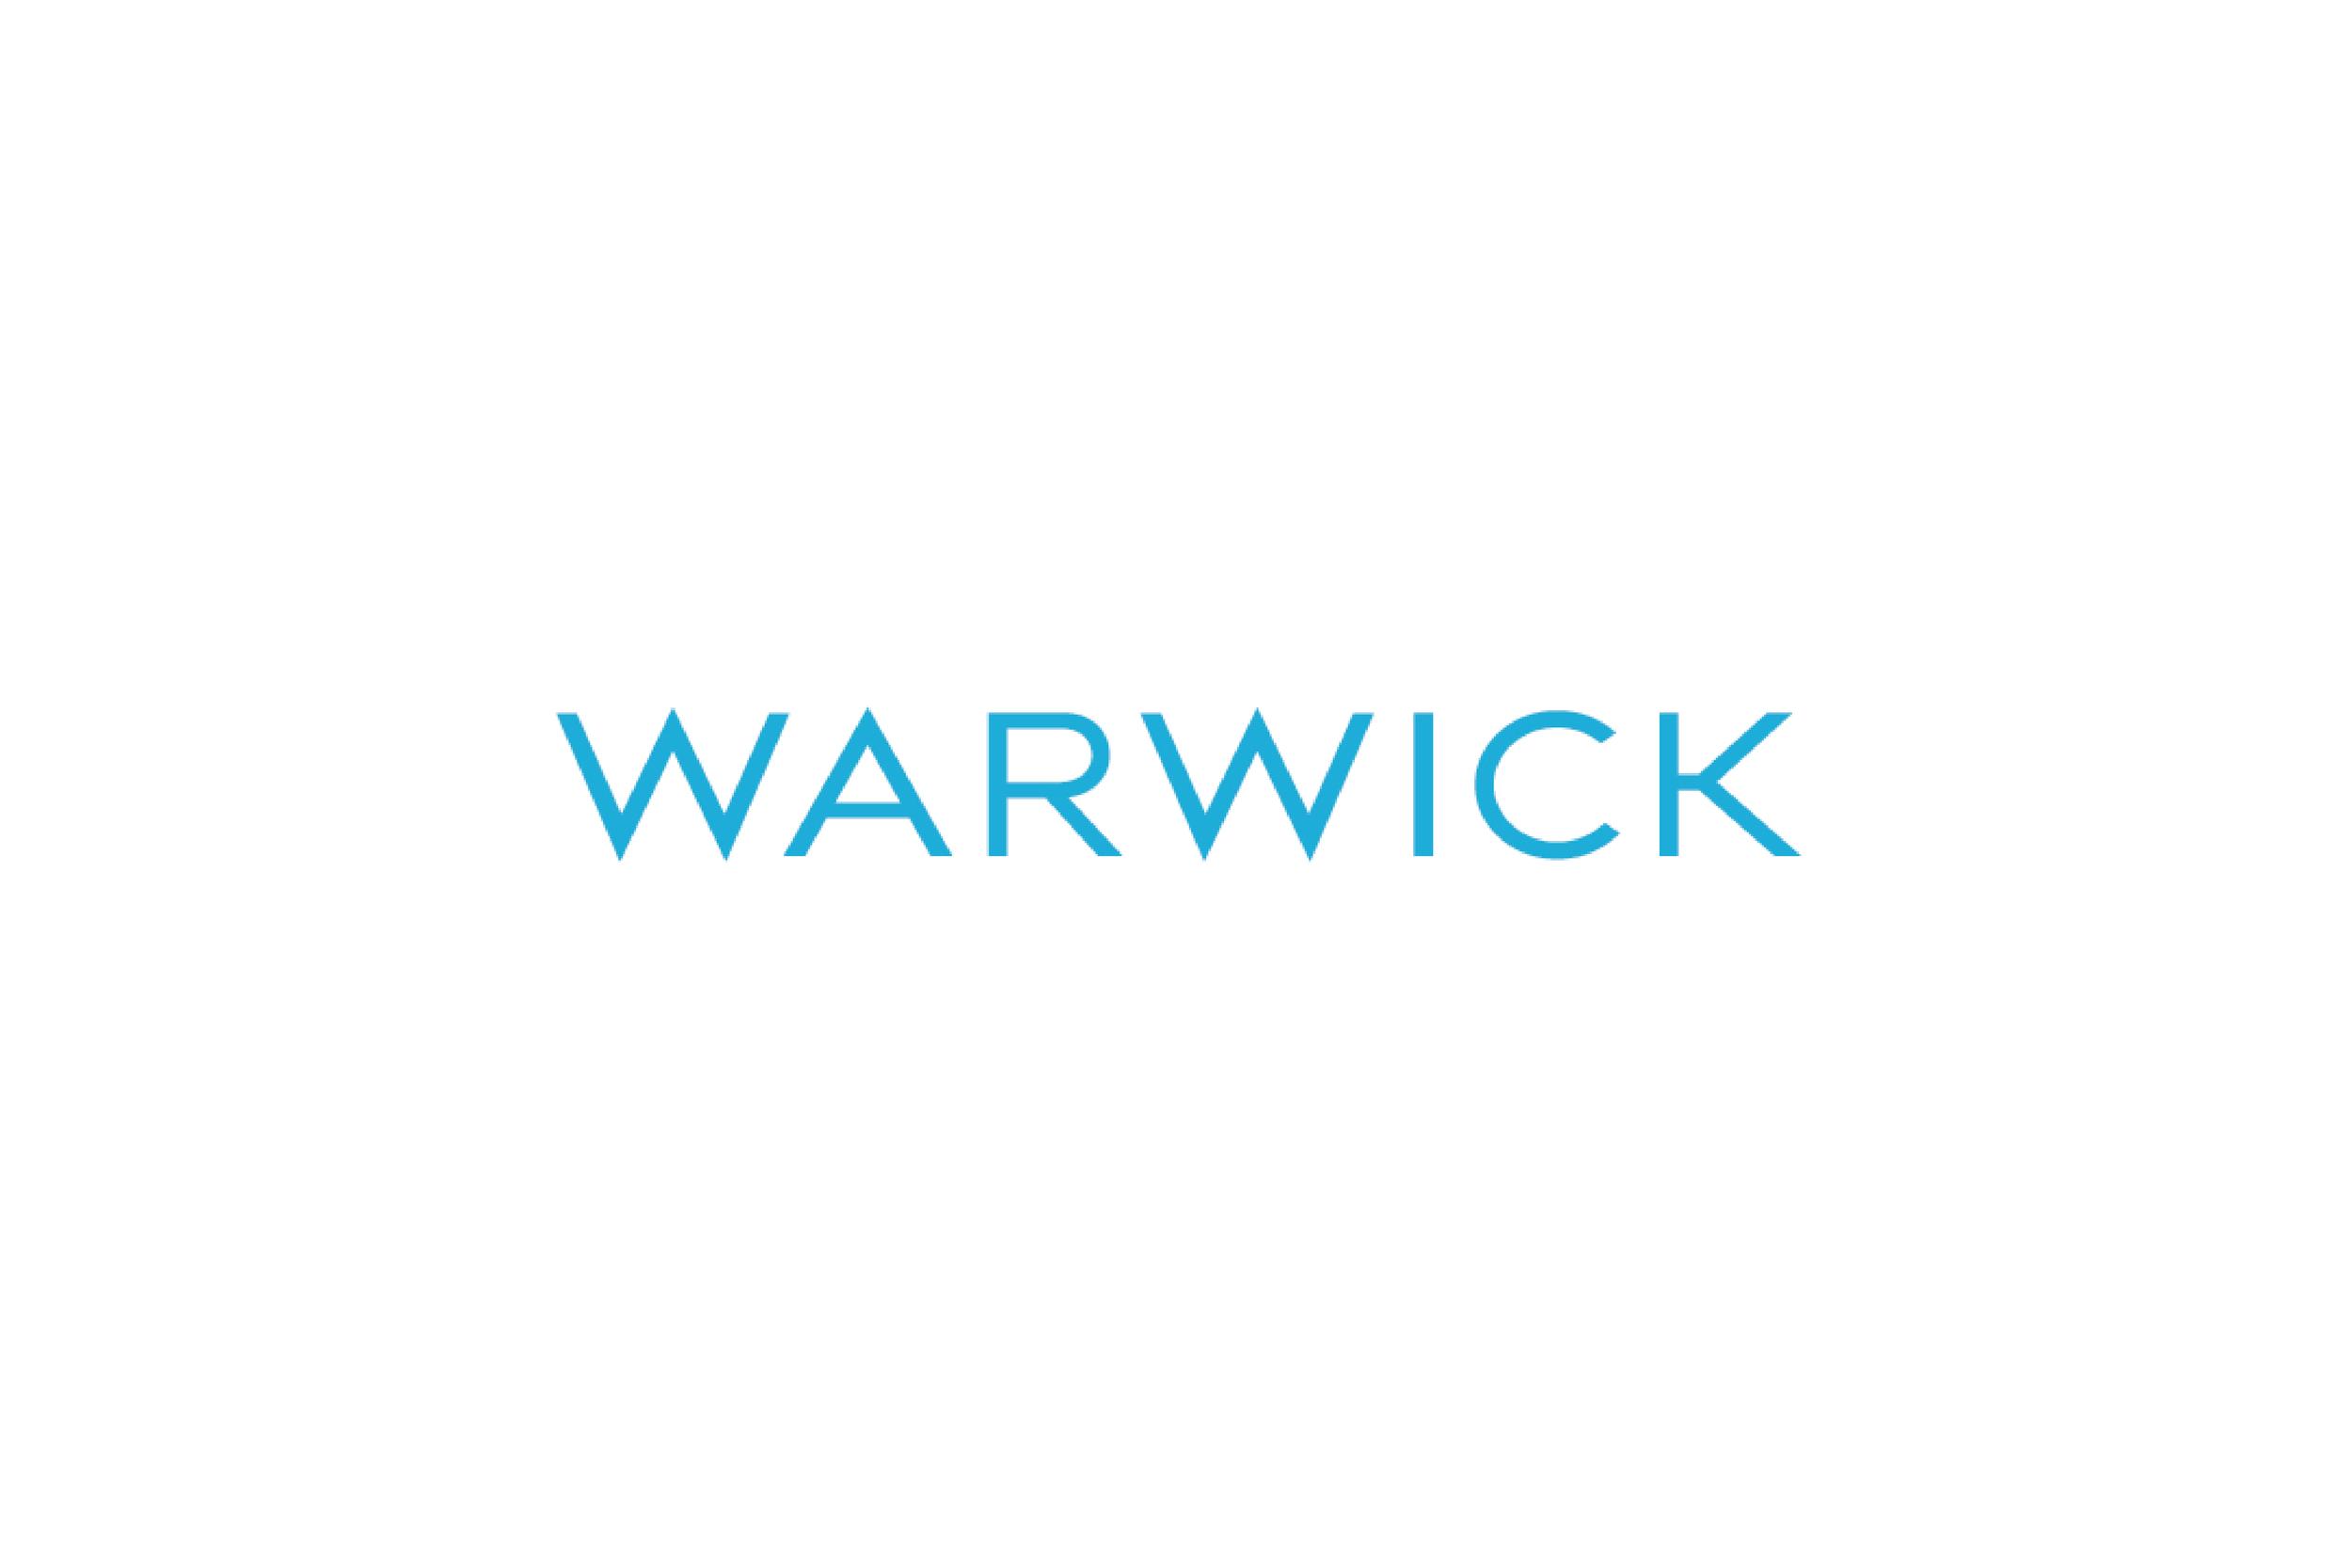 Warwick-01.png